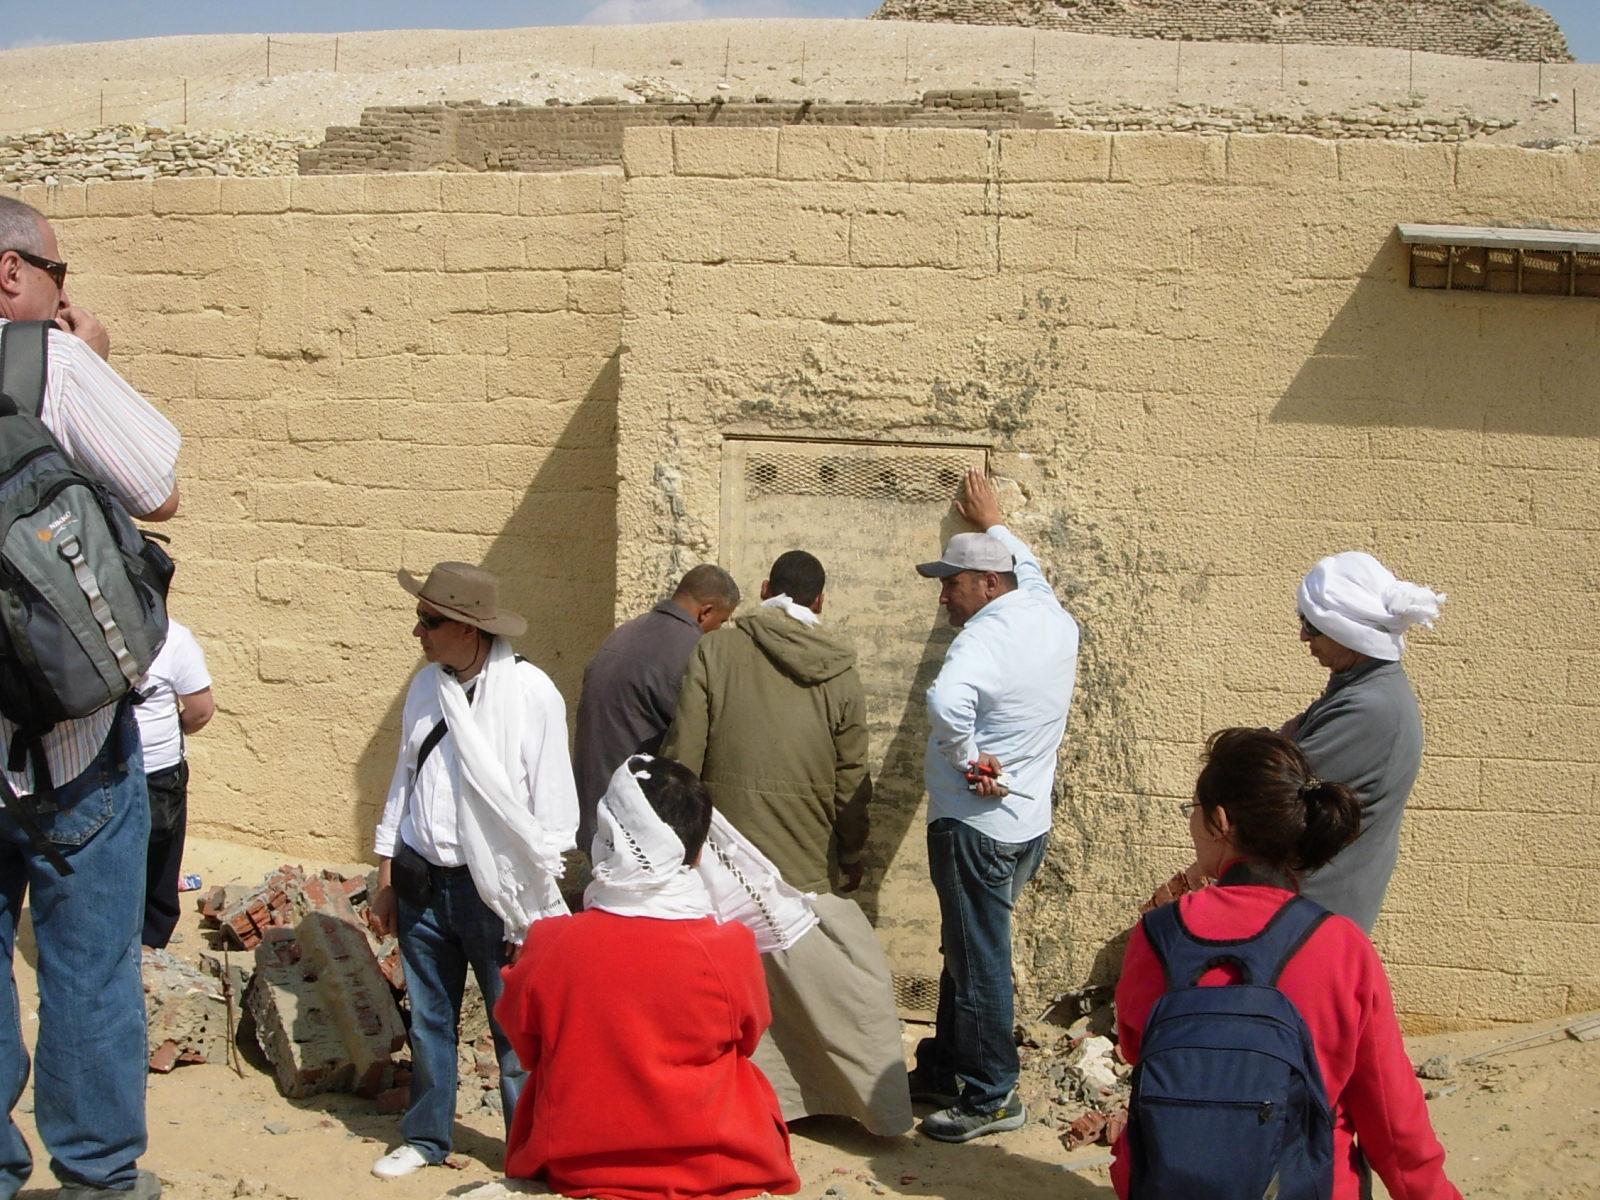 Saqqara tumba de Nebennebef 2010